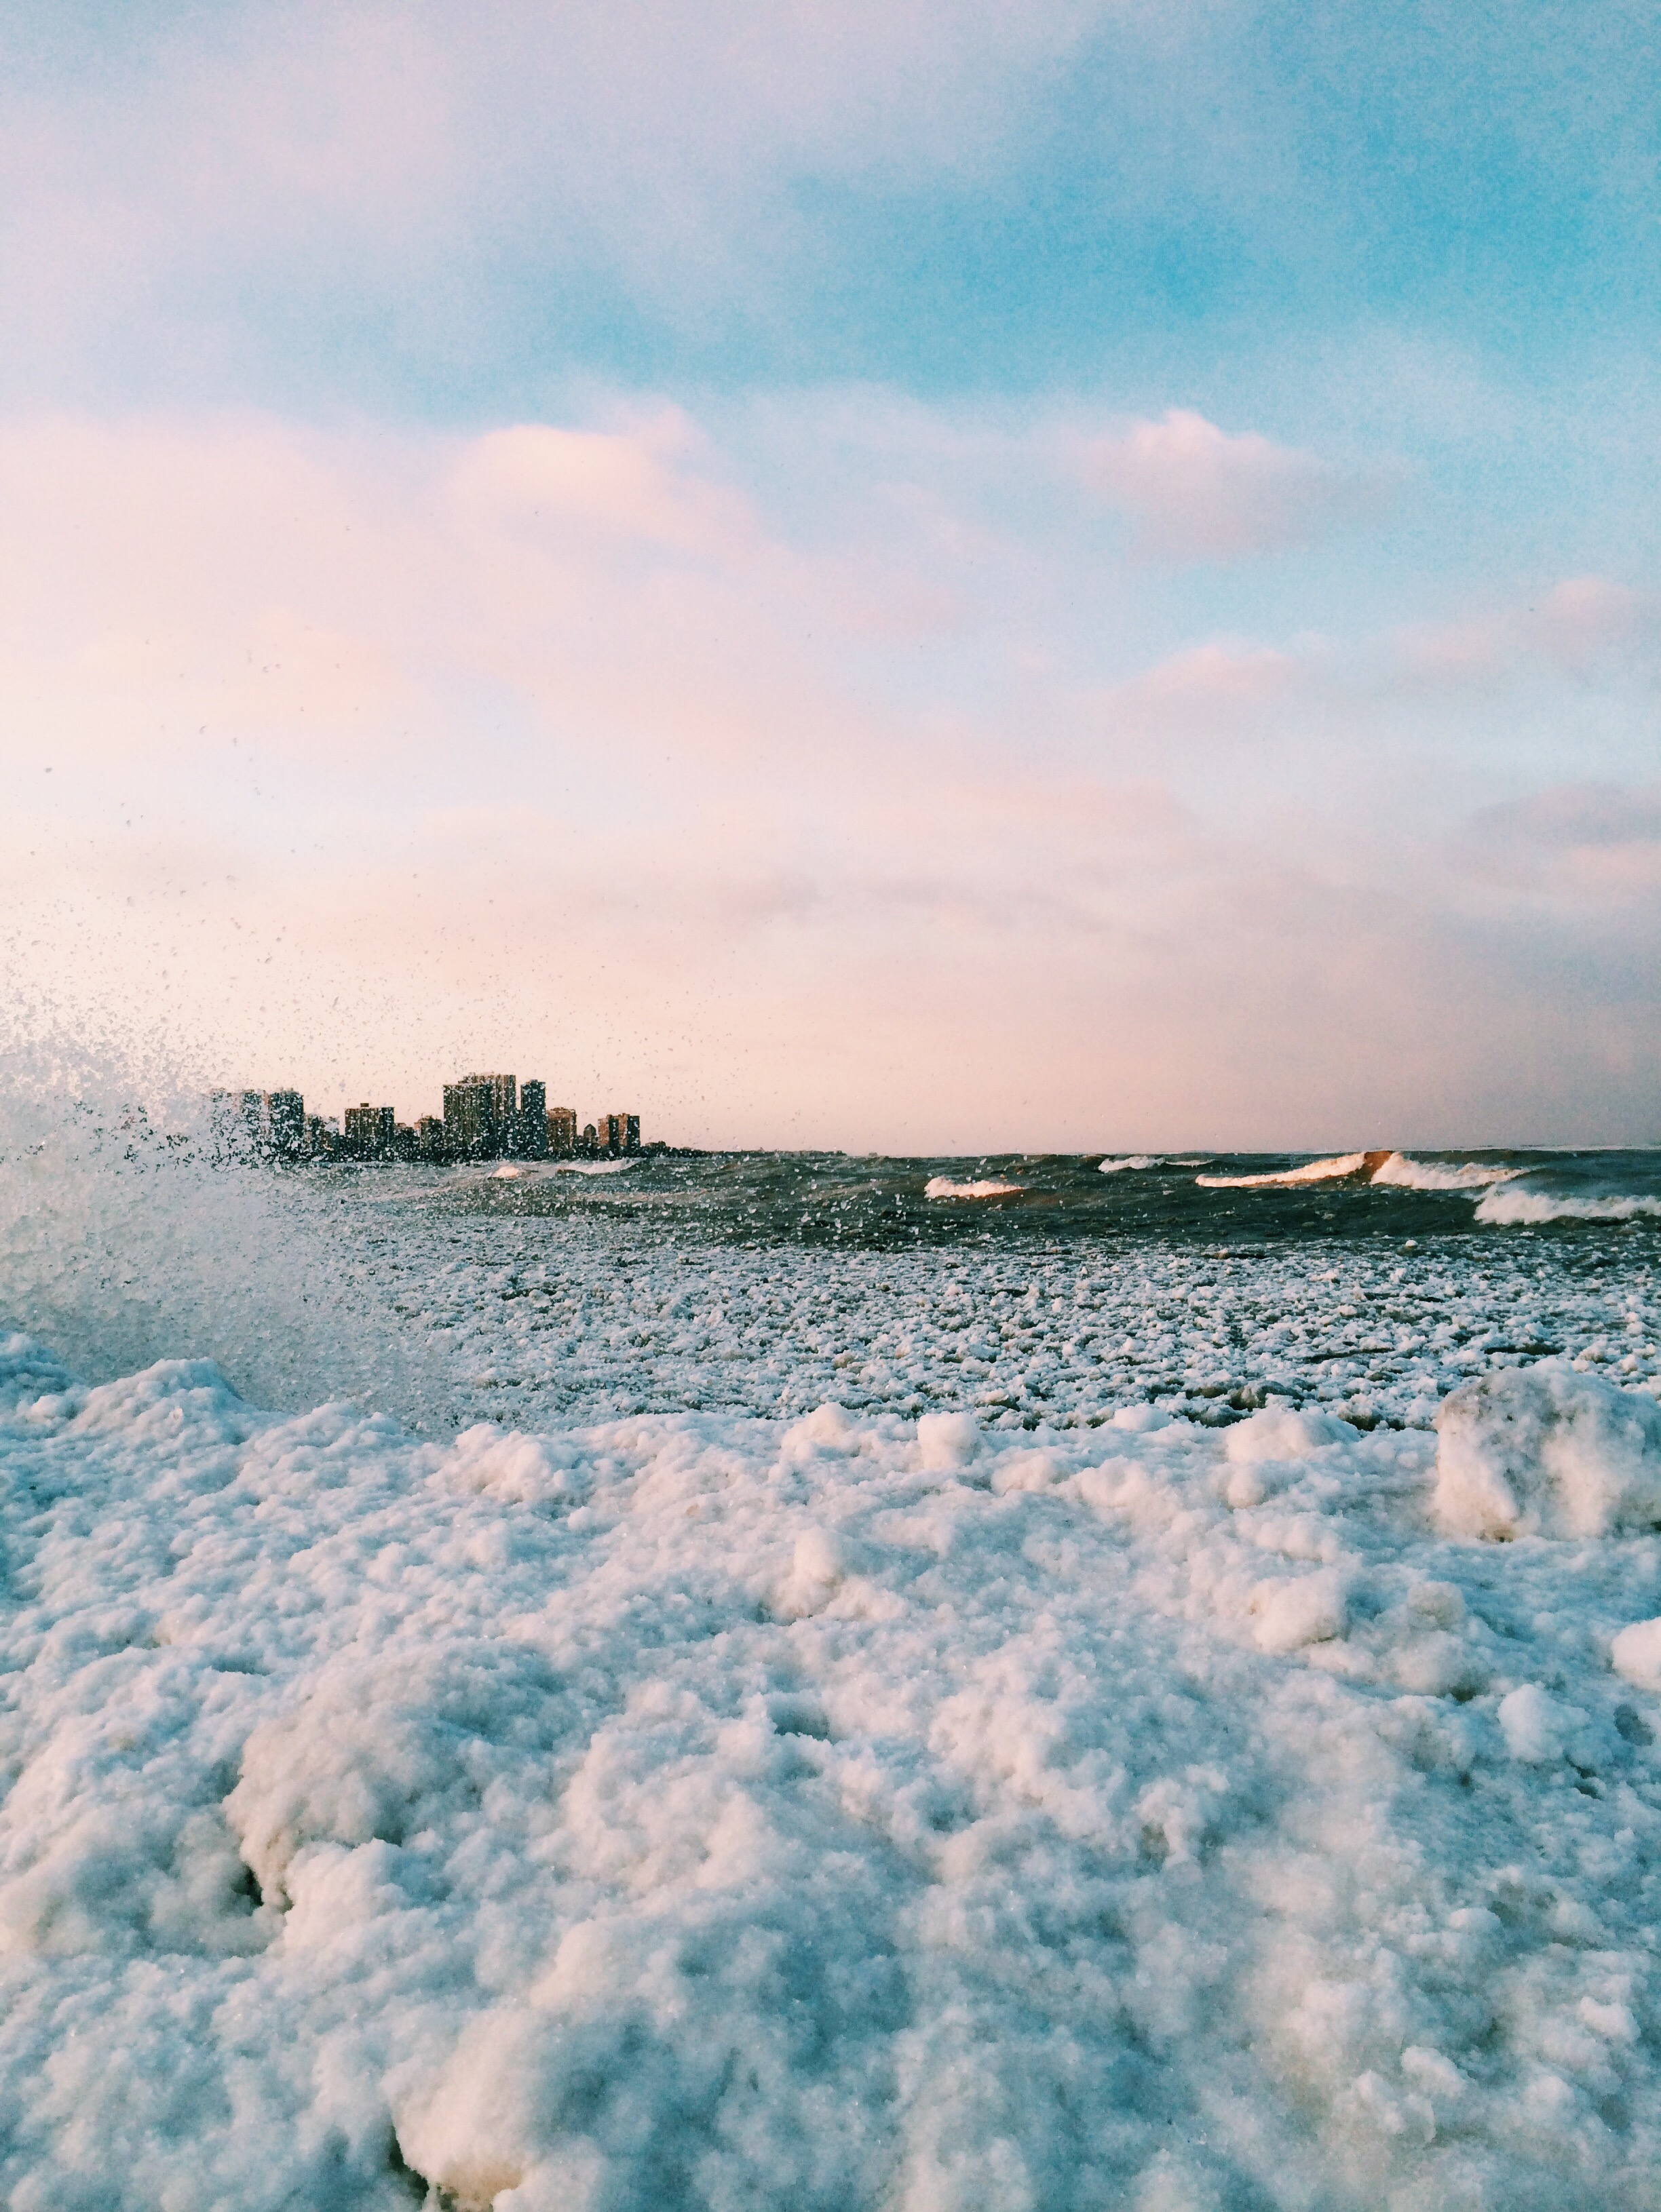 LakeMichigan_BrynaShields4